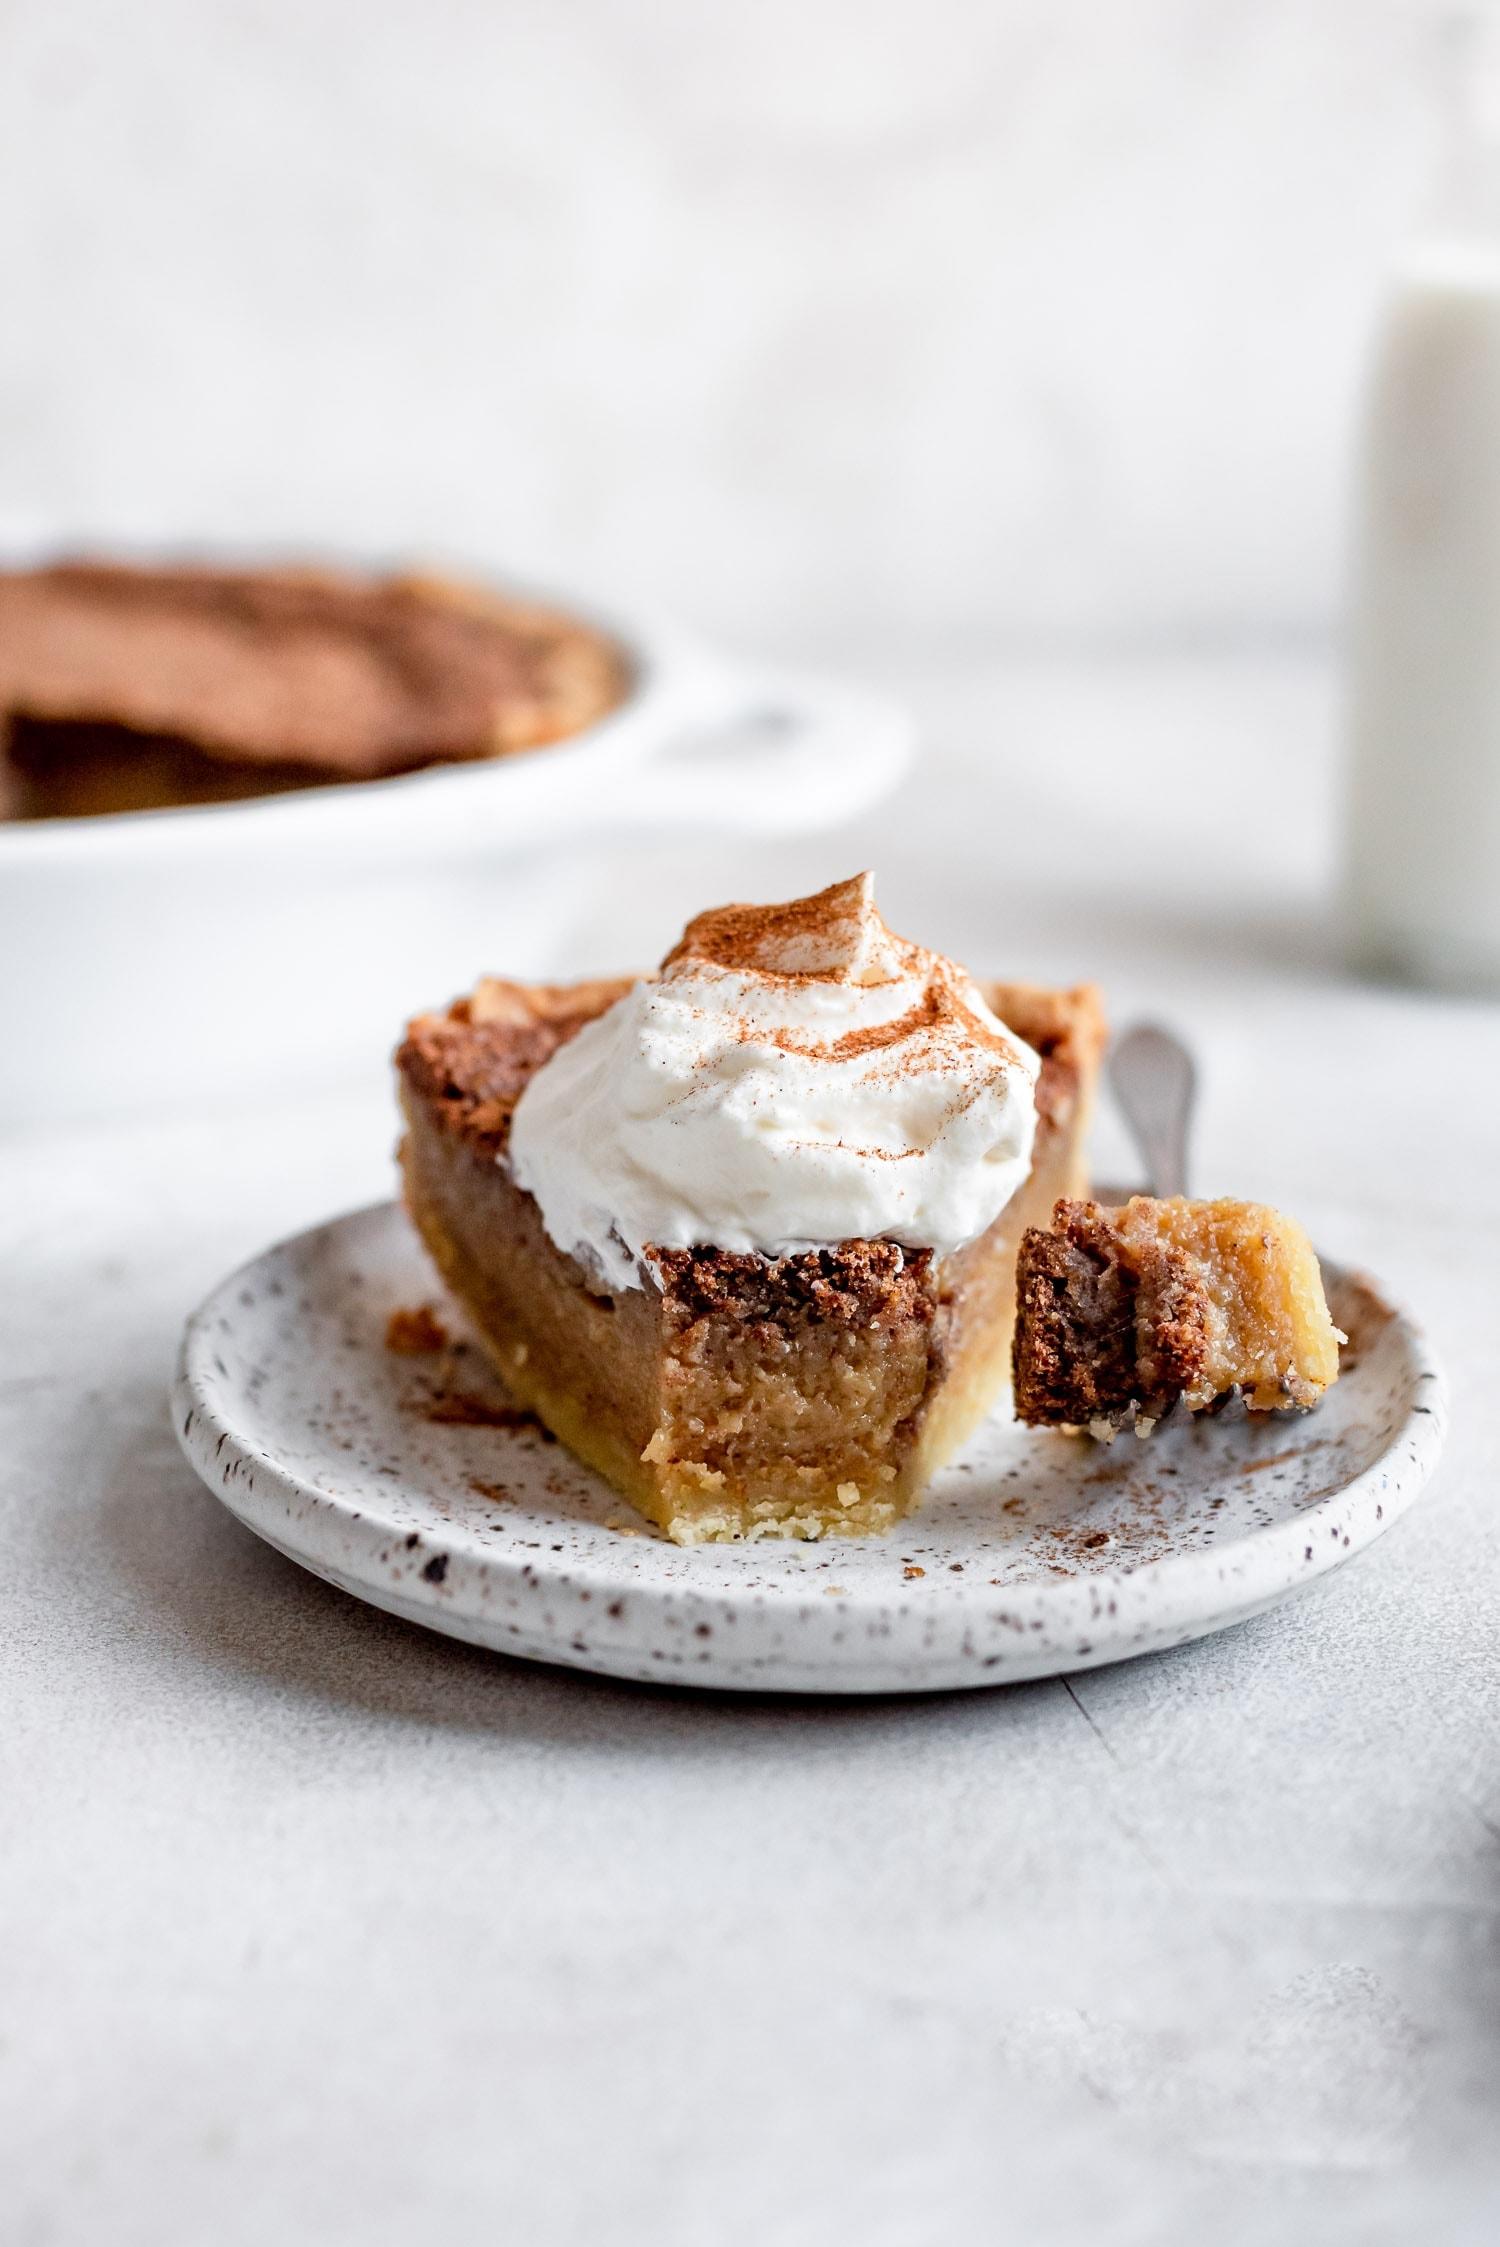 bite missing from slice of pie